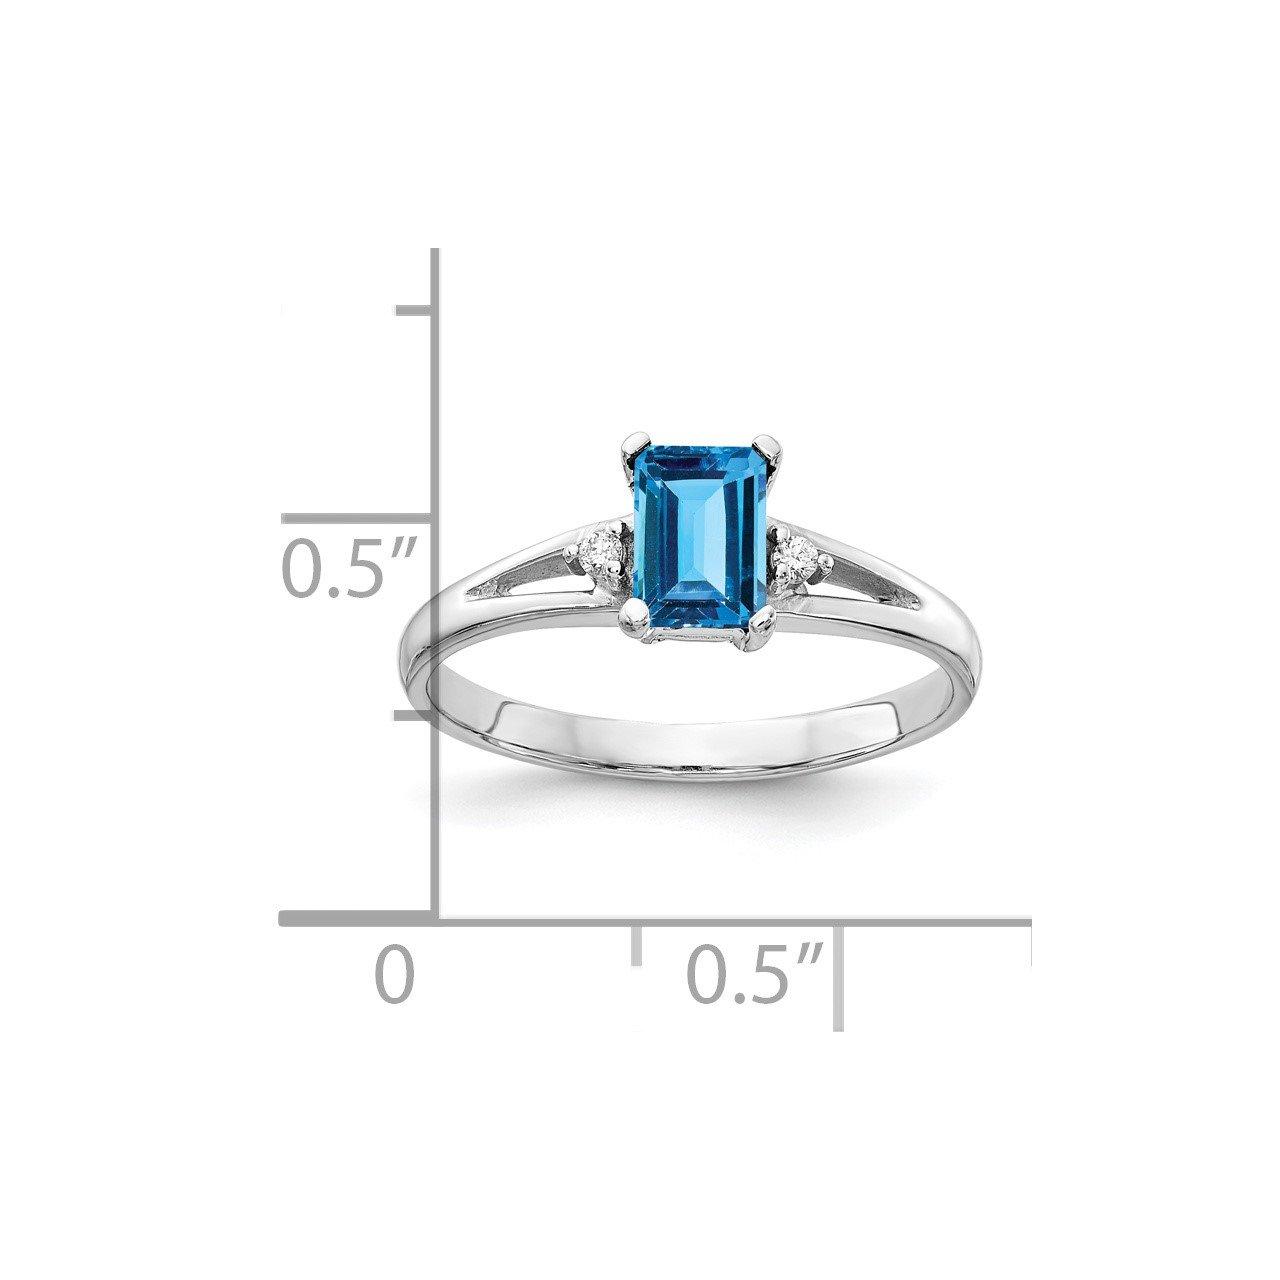 14k White Gold 6x4mm Emerald Cut Blue Topaz AA Diamond ring-1